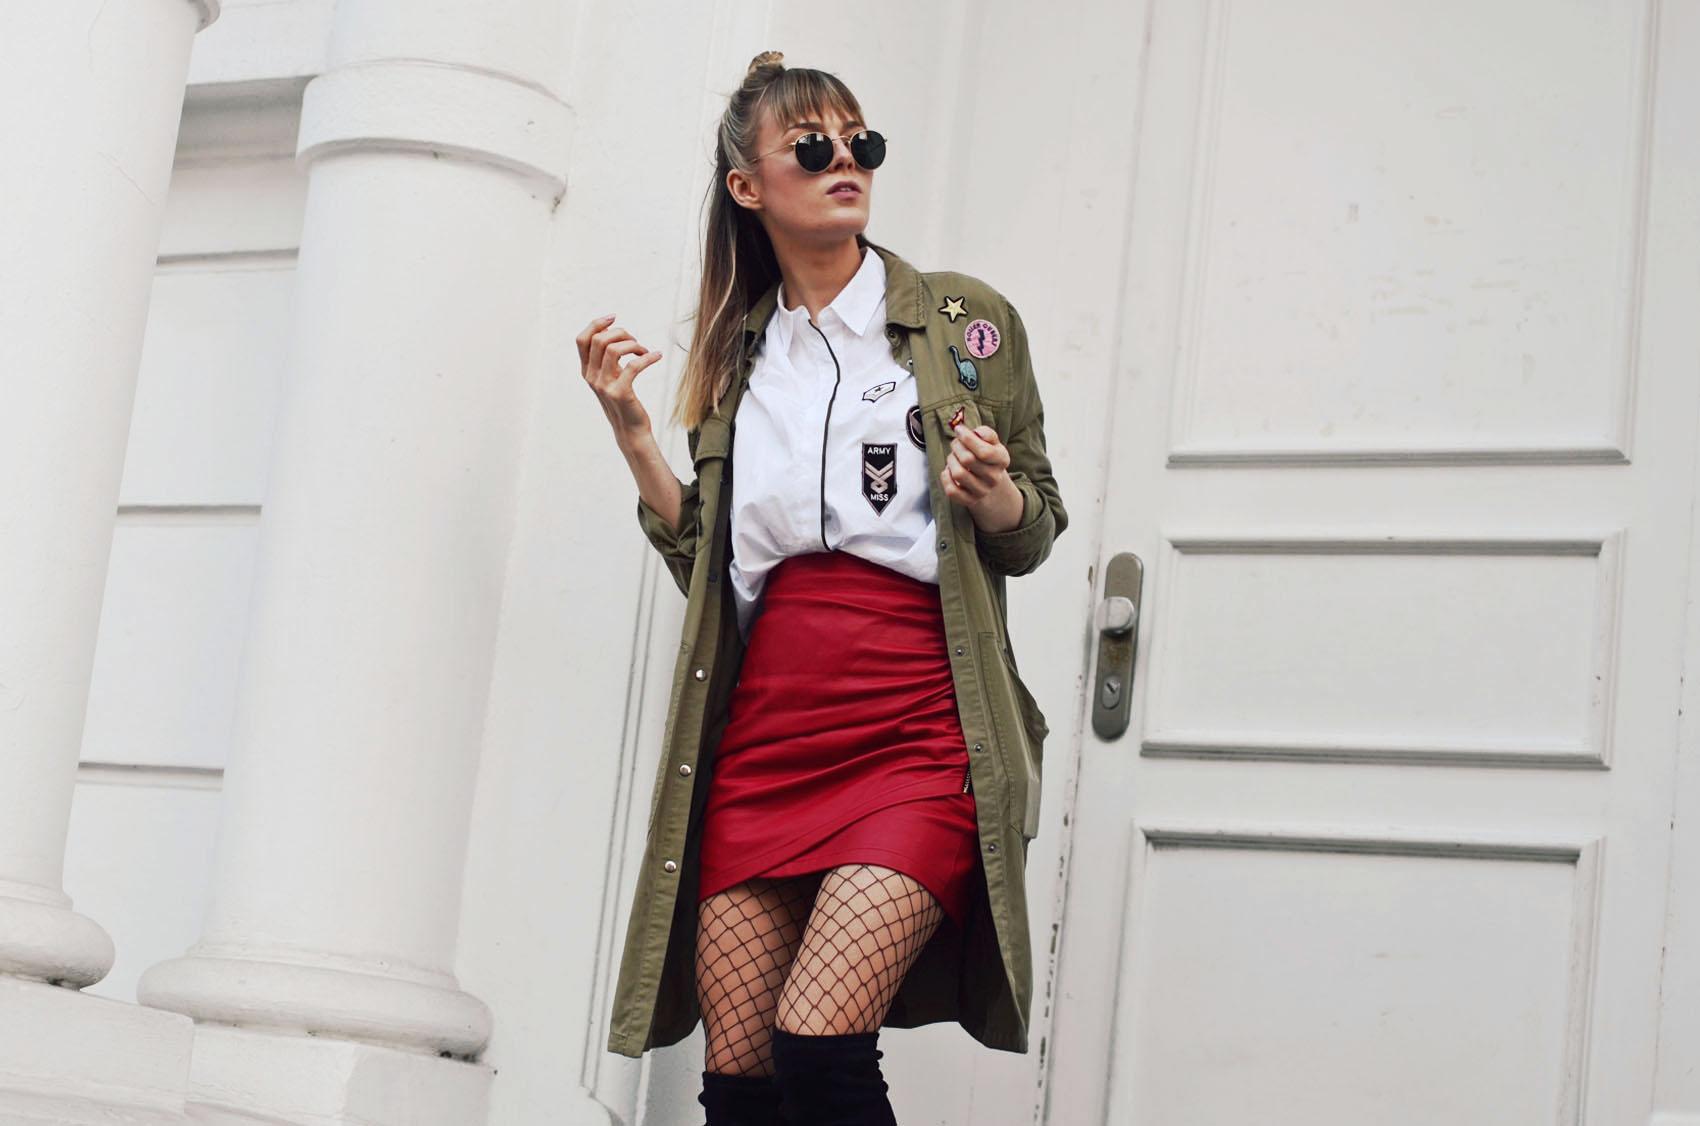 roter rock, lederrock, overknees, stiefel, netzstrumpfhose, bluse, parka, sonnenbrille